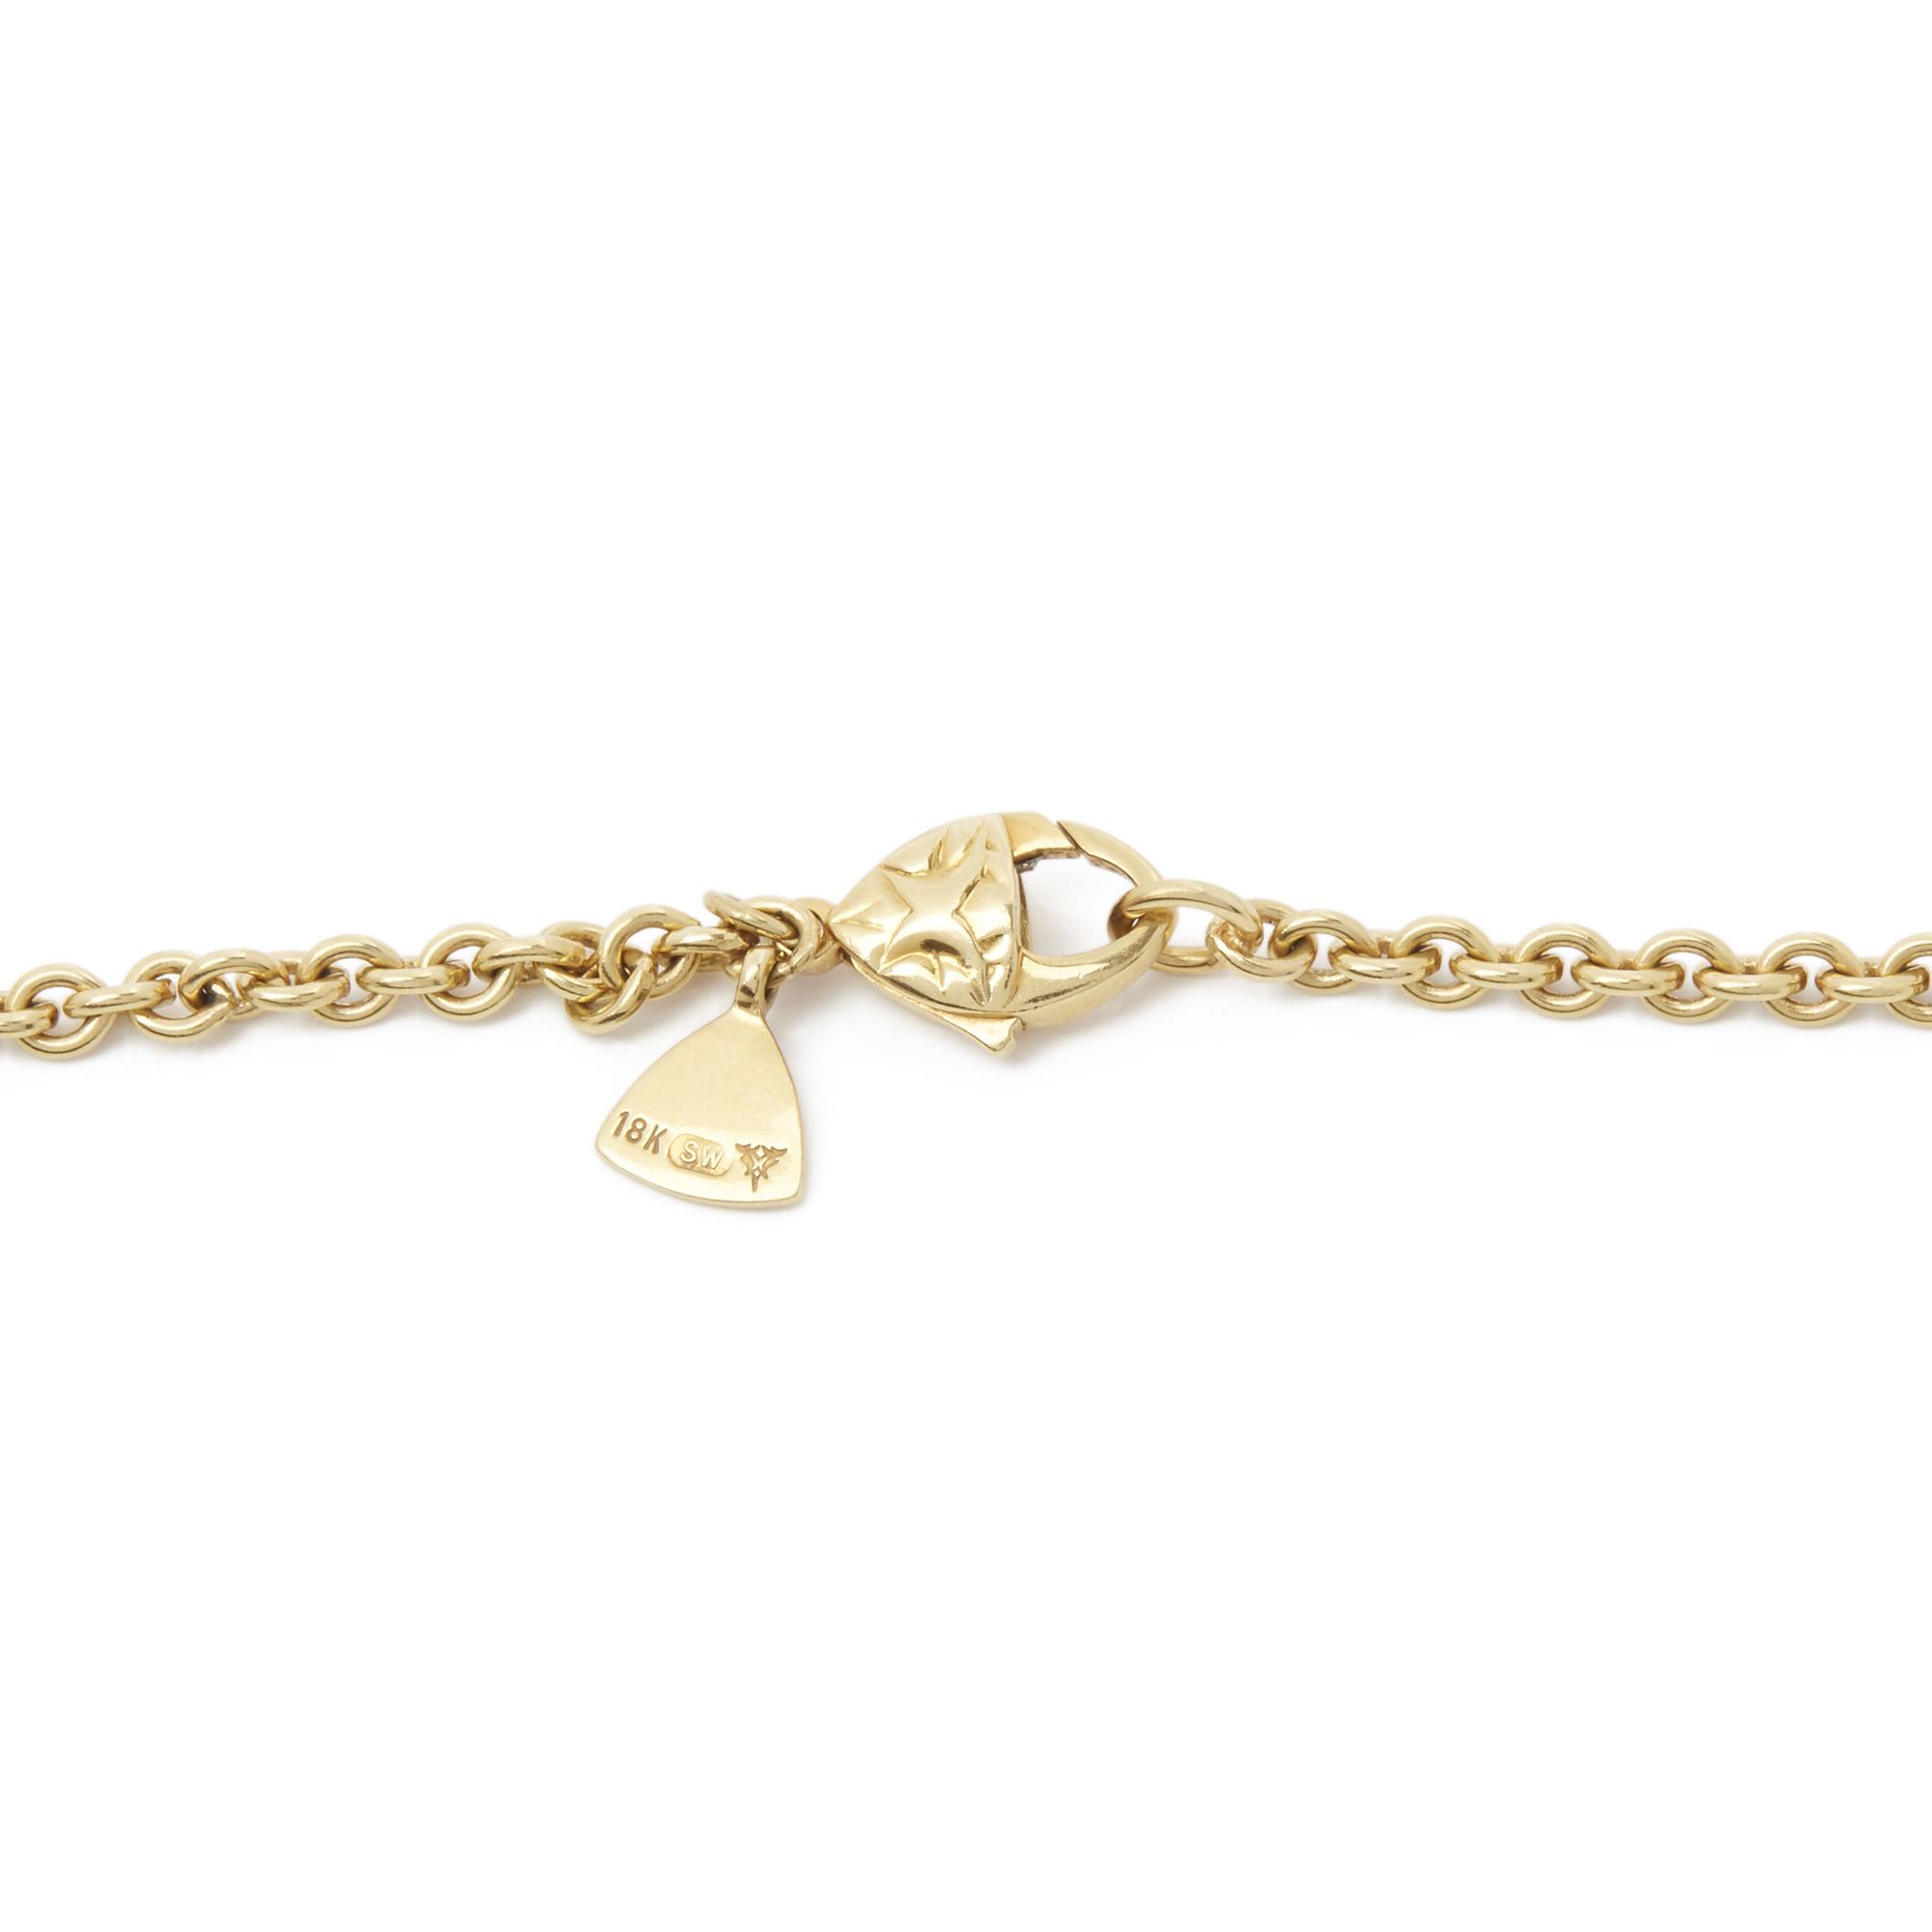 Stephen Webster 18k Yellow Gold Citrine & Diamond Crystal Haze Pendant Necklace - Image 7 of 8